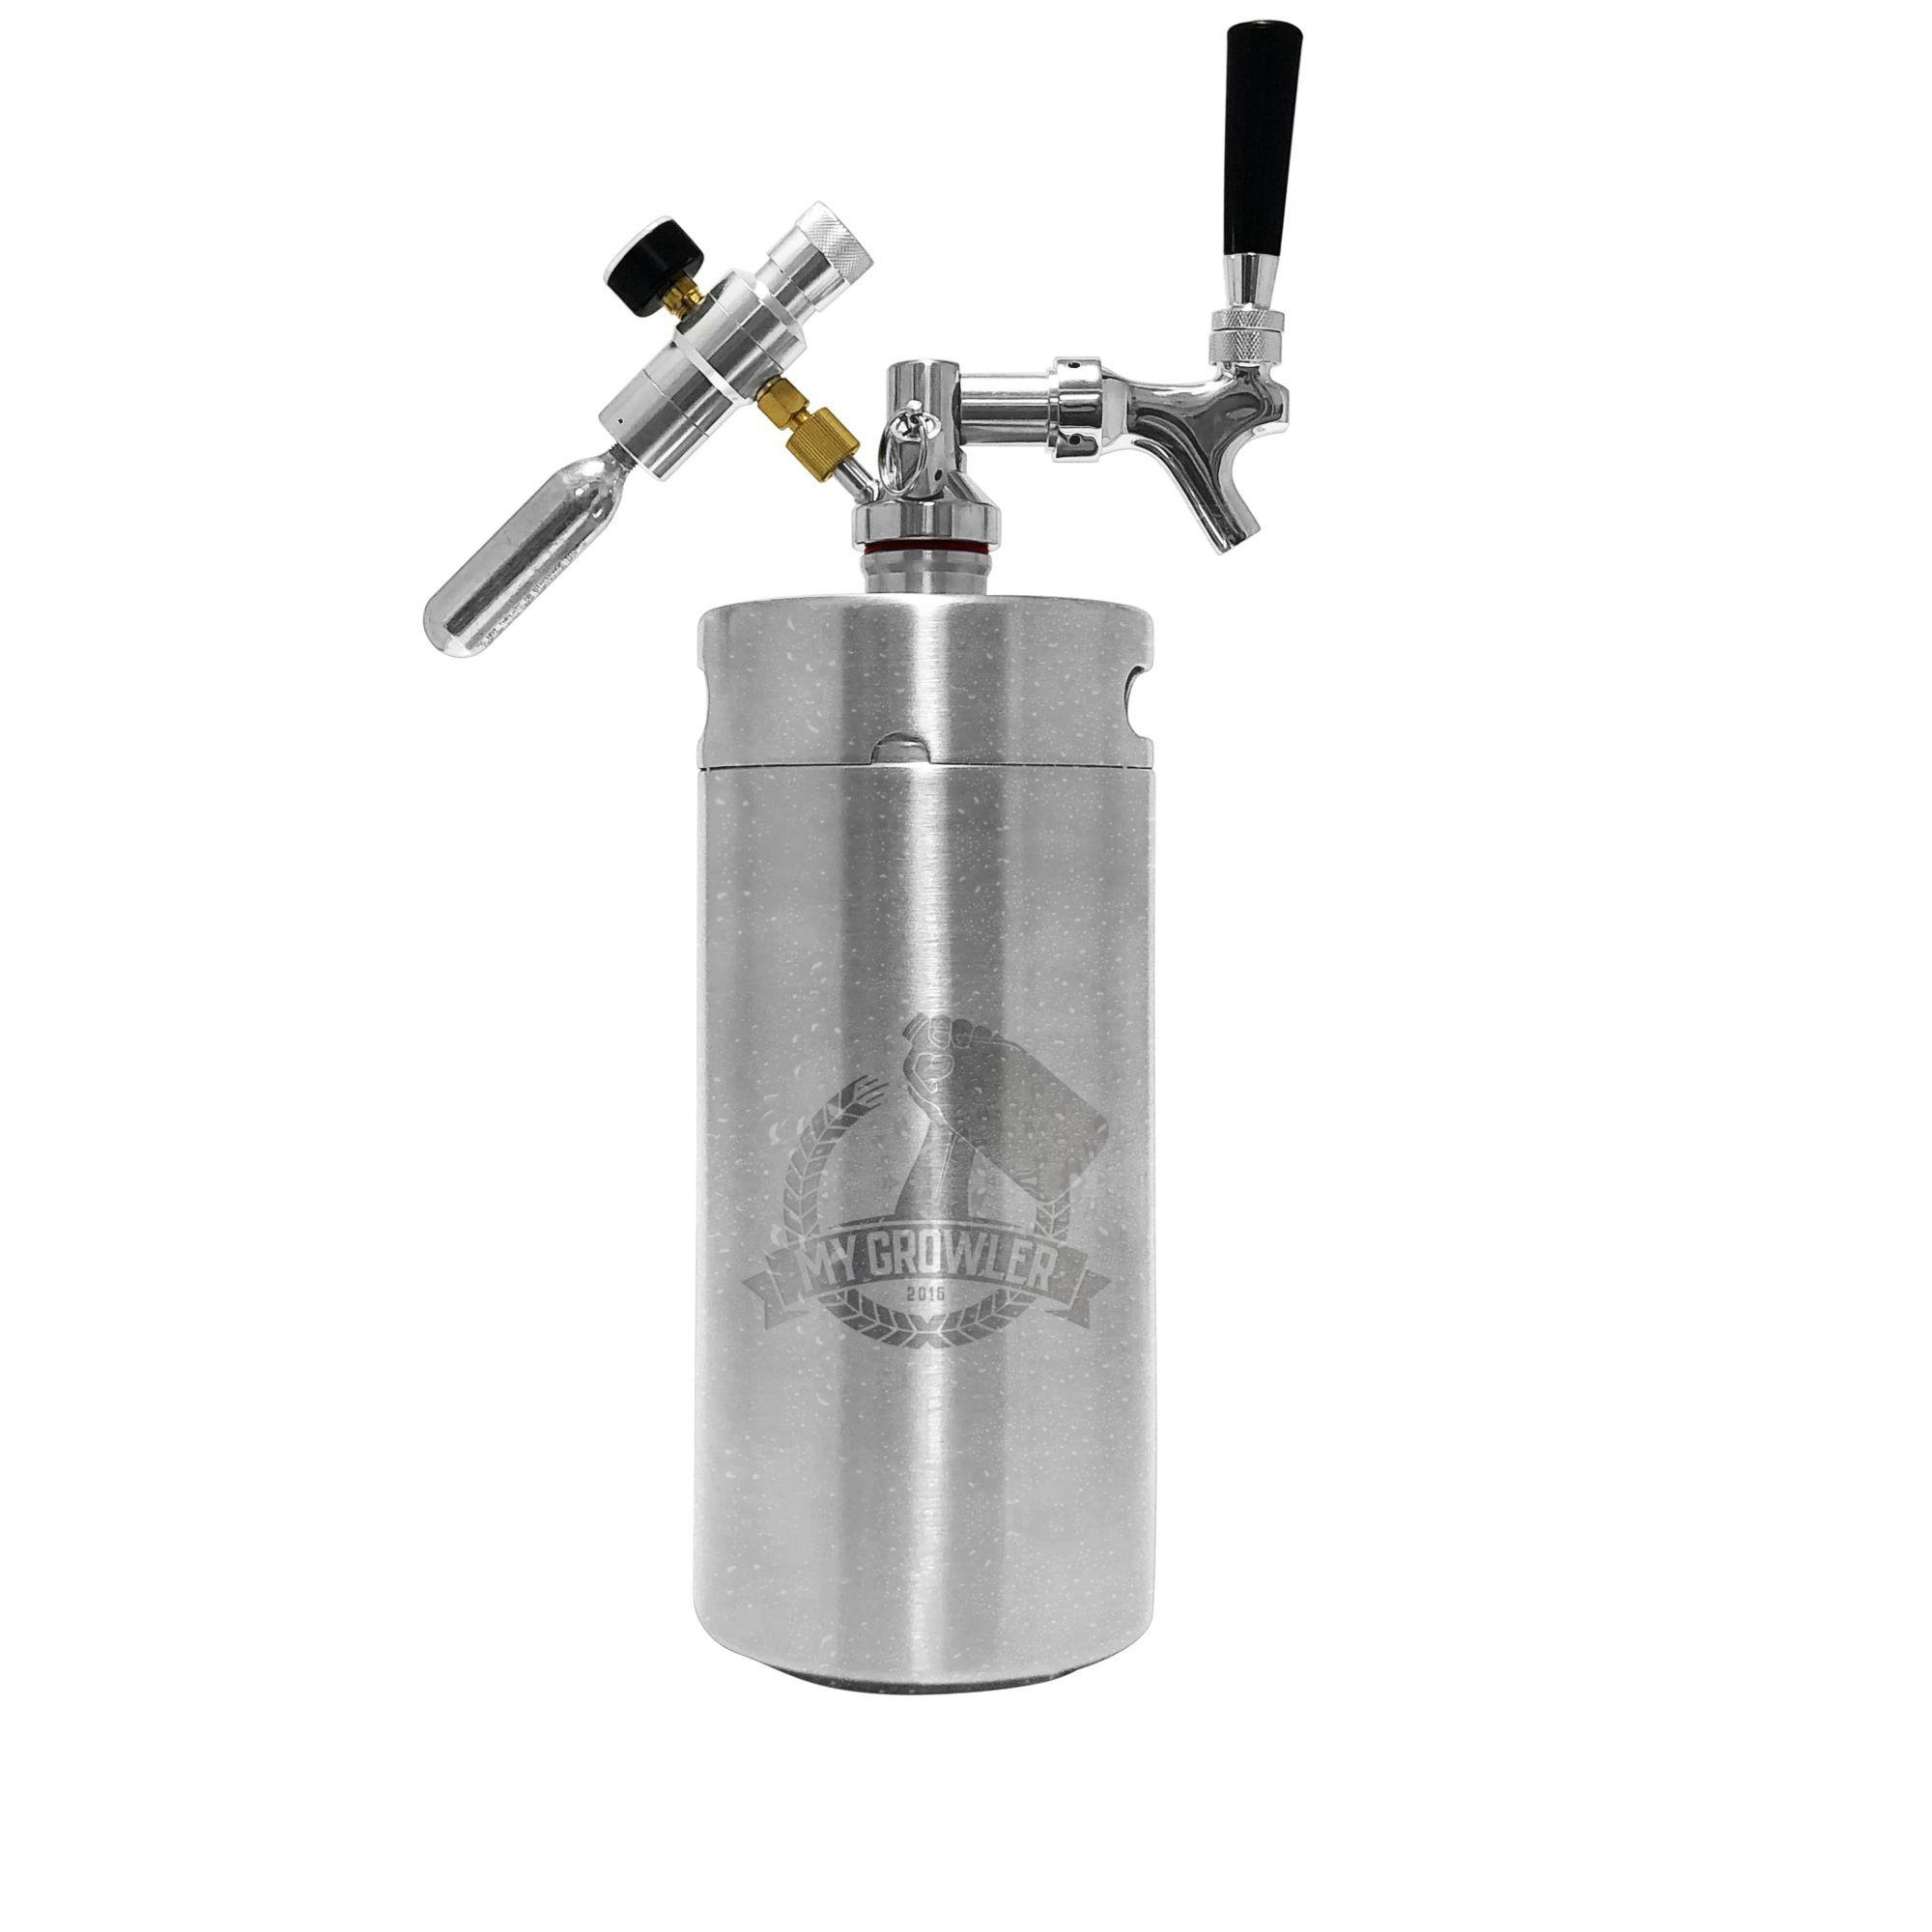 Kit My Keg Growler Inox 3,8L com Torneira Americana Standard